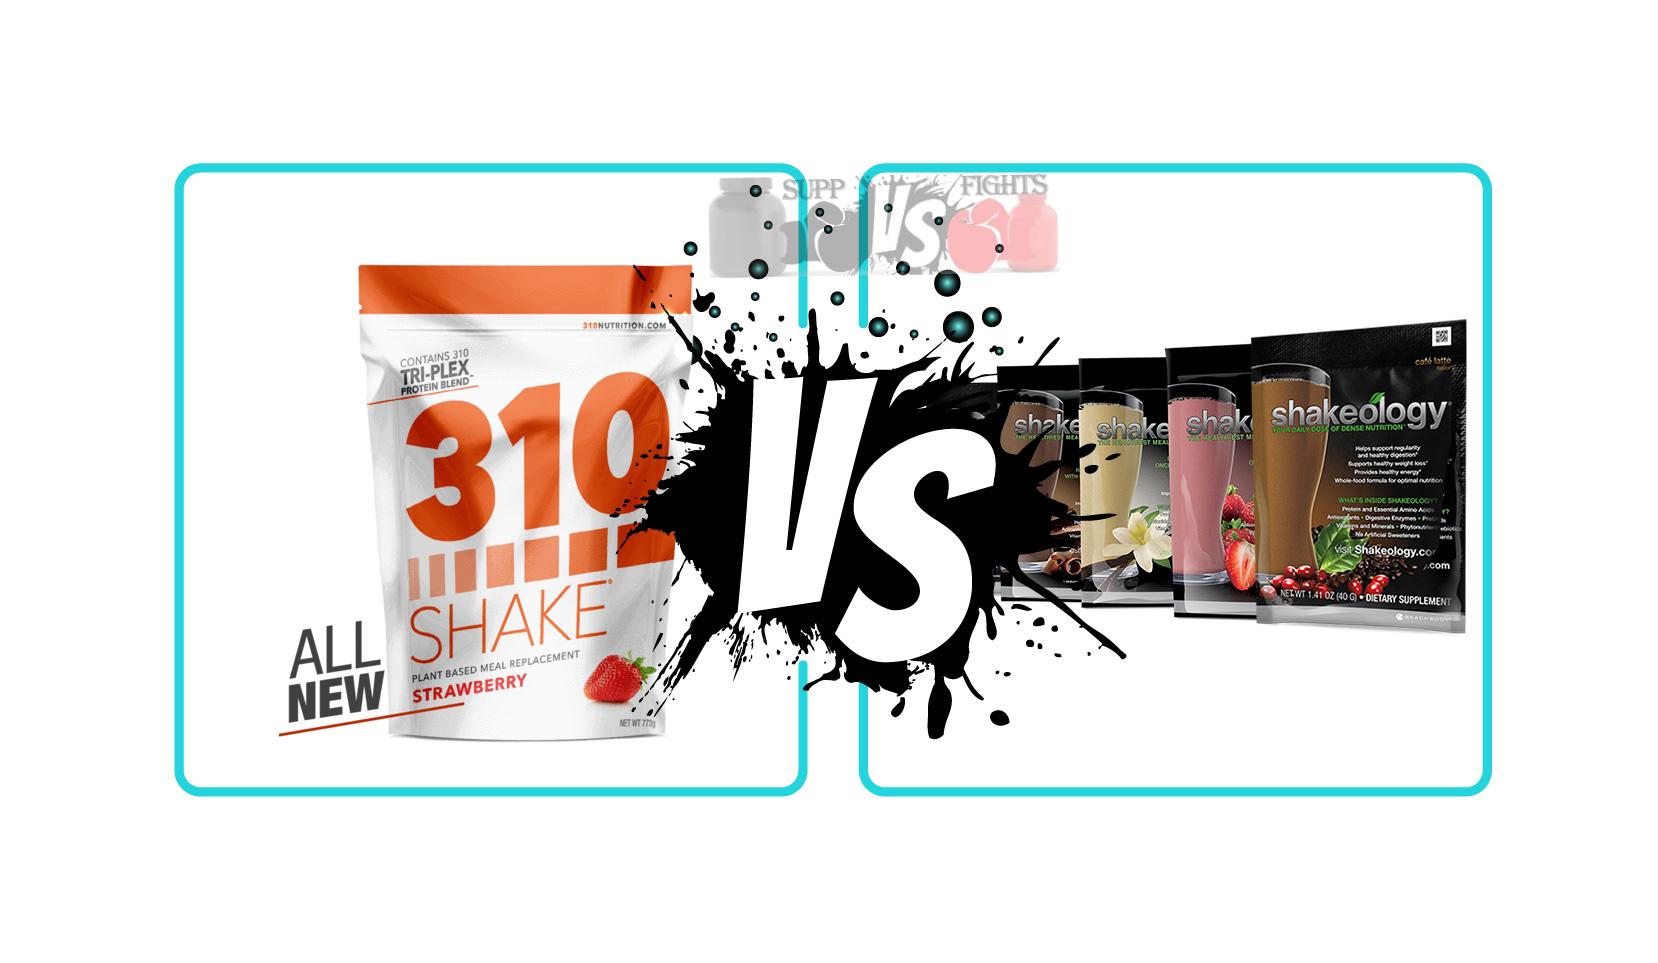 Vs Shake 310 Shakeology